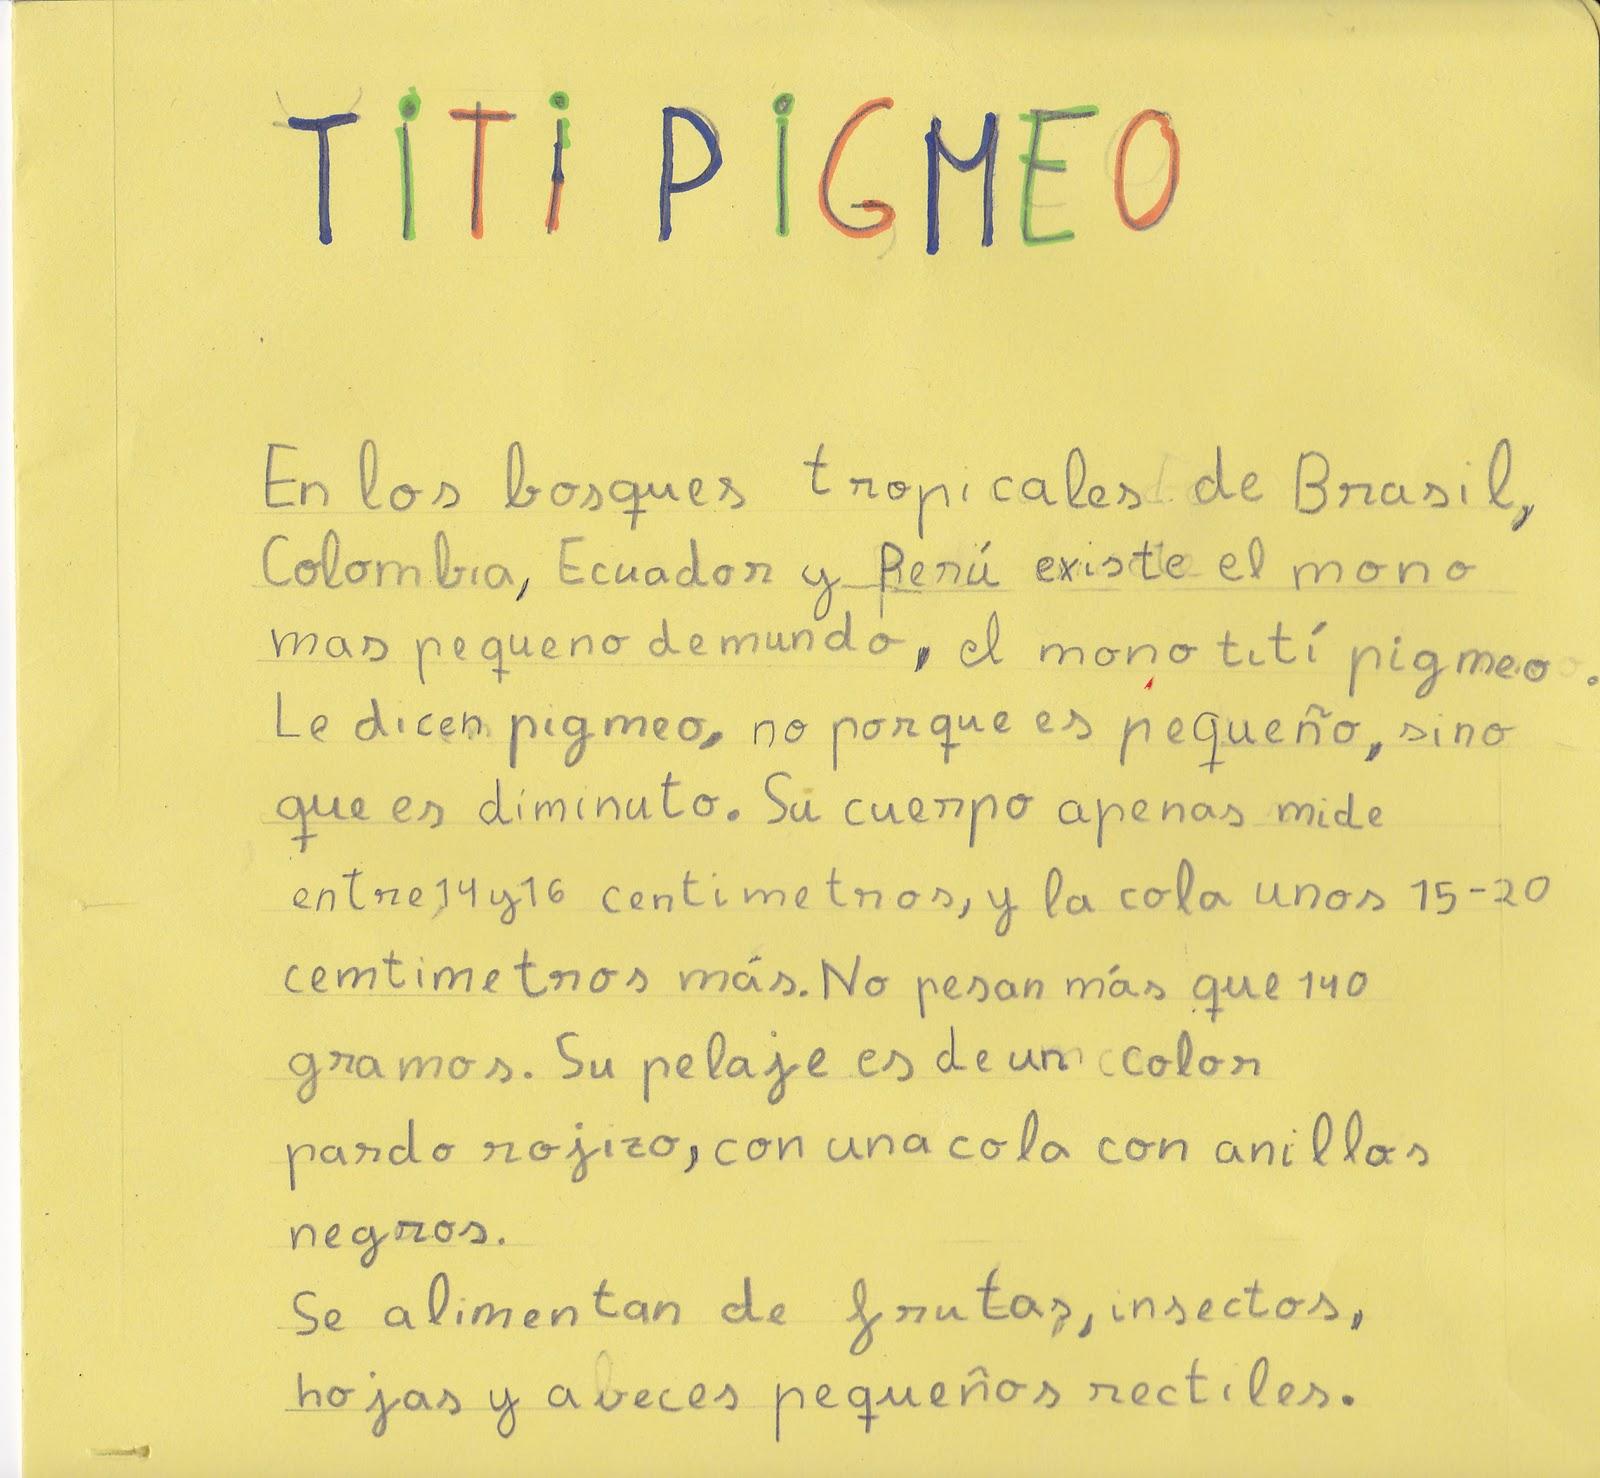 Ceip El Zargal Second Grade Titi Pigmeo Carmen